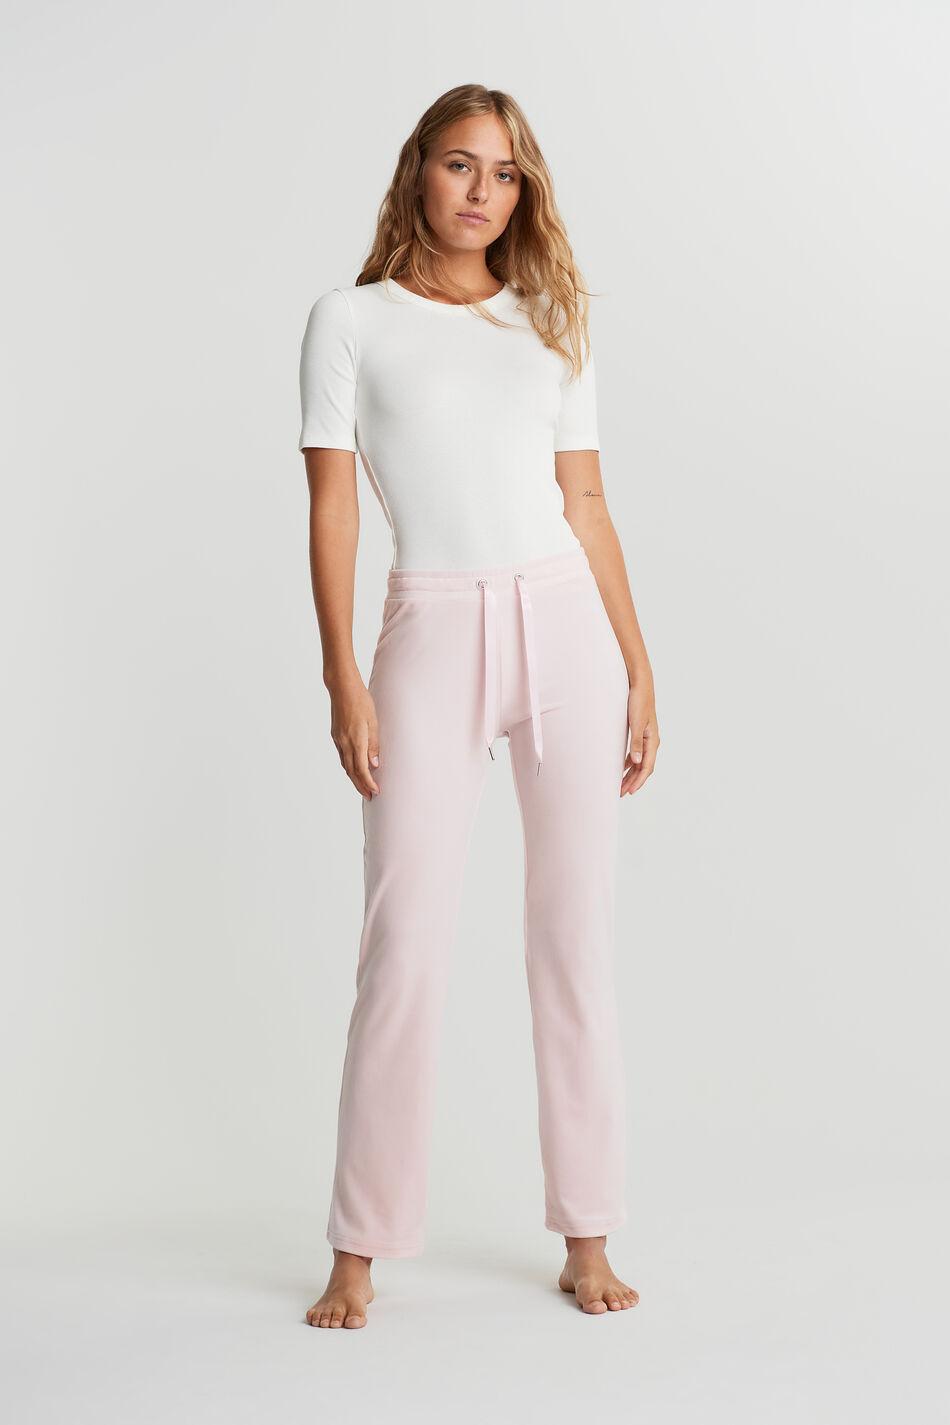 Gina Tricot Cecilia velour trousers XXS Female Light pink